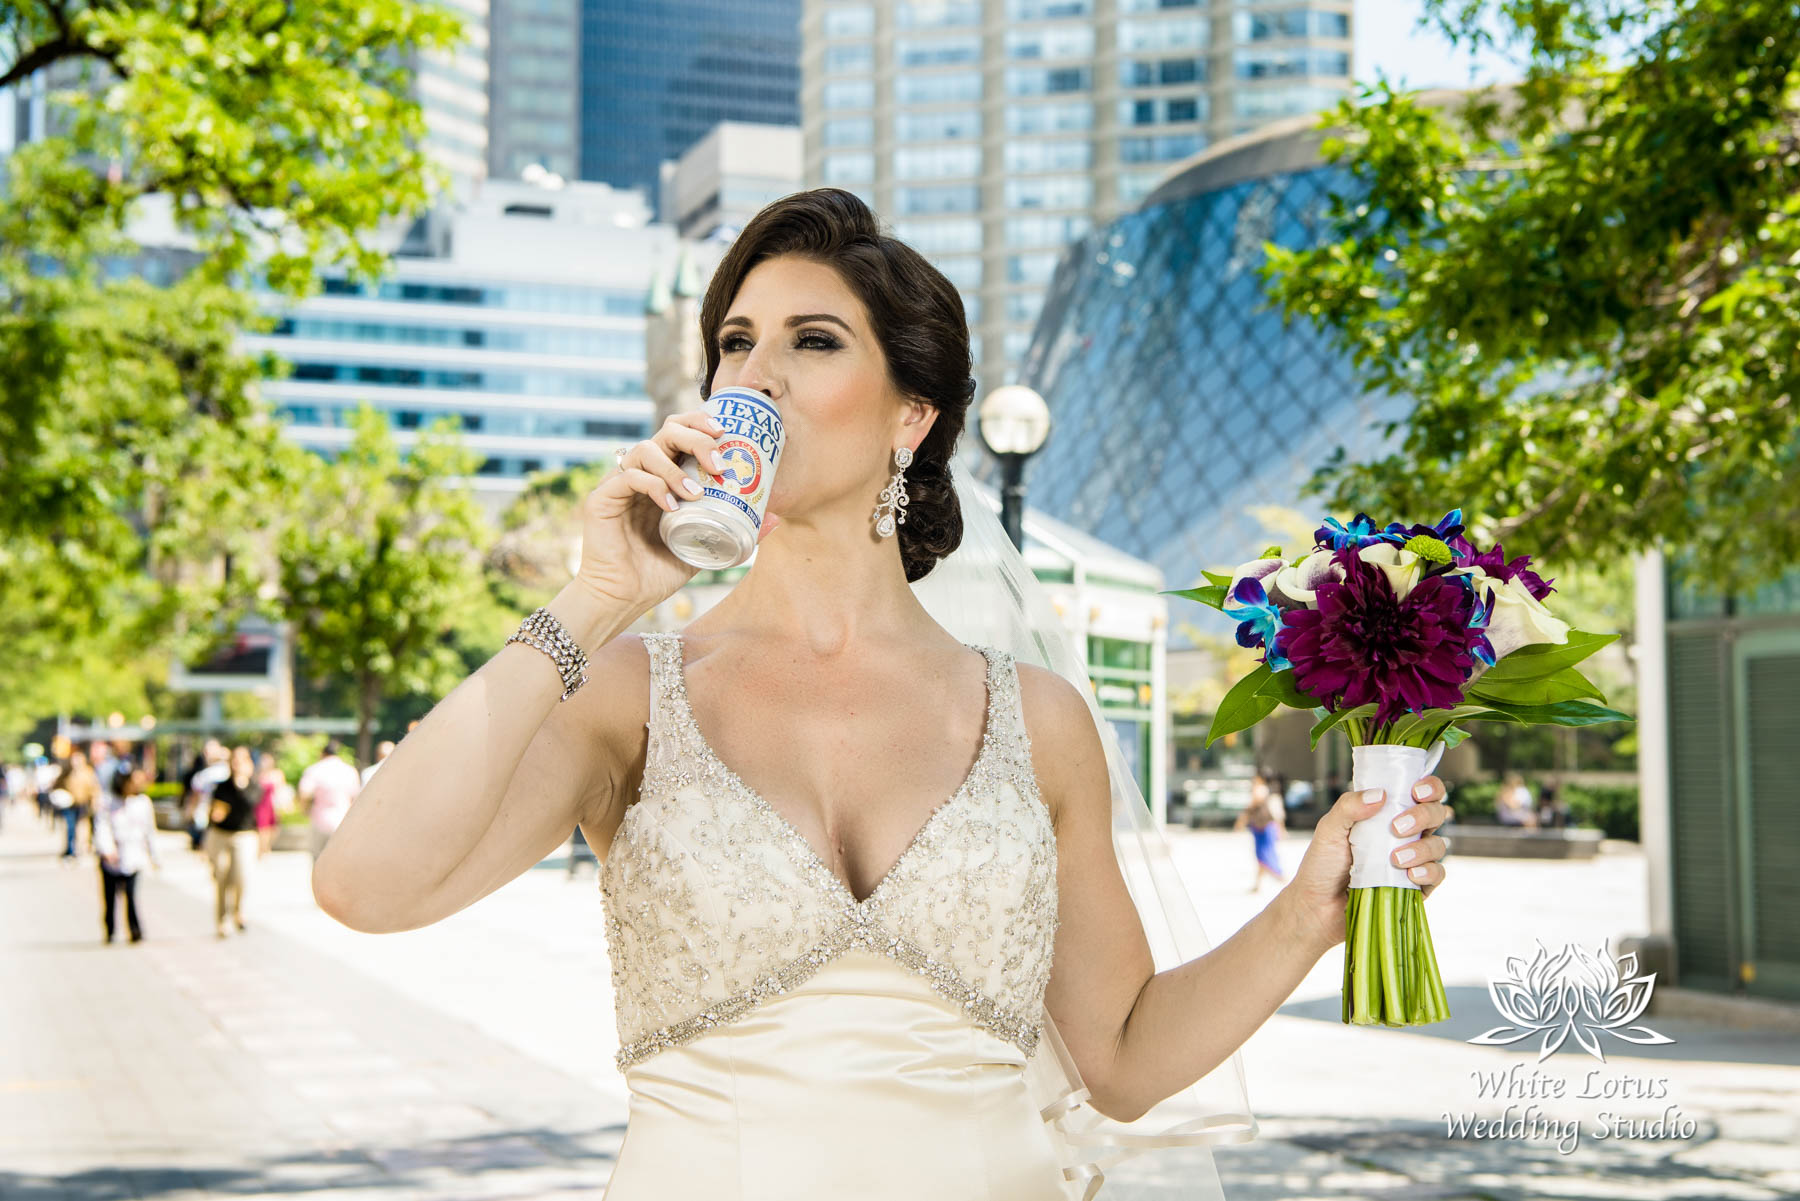 076 - Wedding - Toronto - Downtown wedding photo-walk - PW